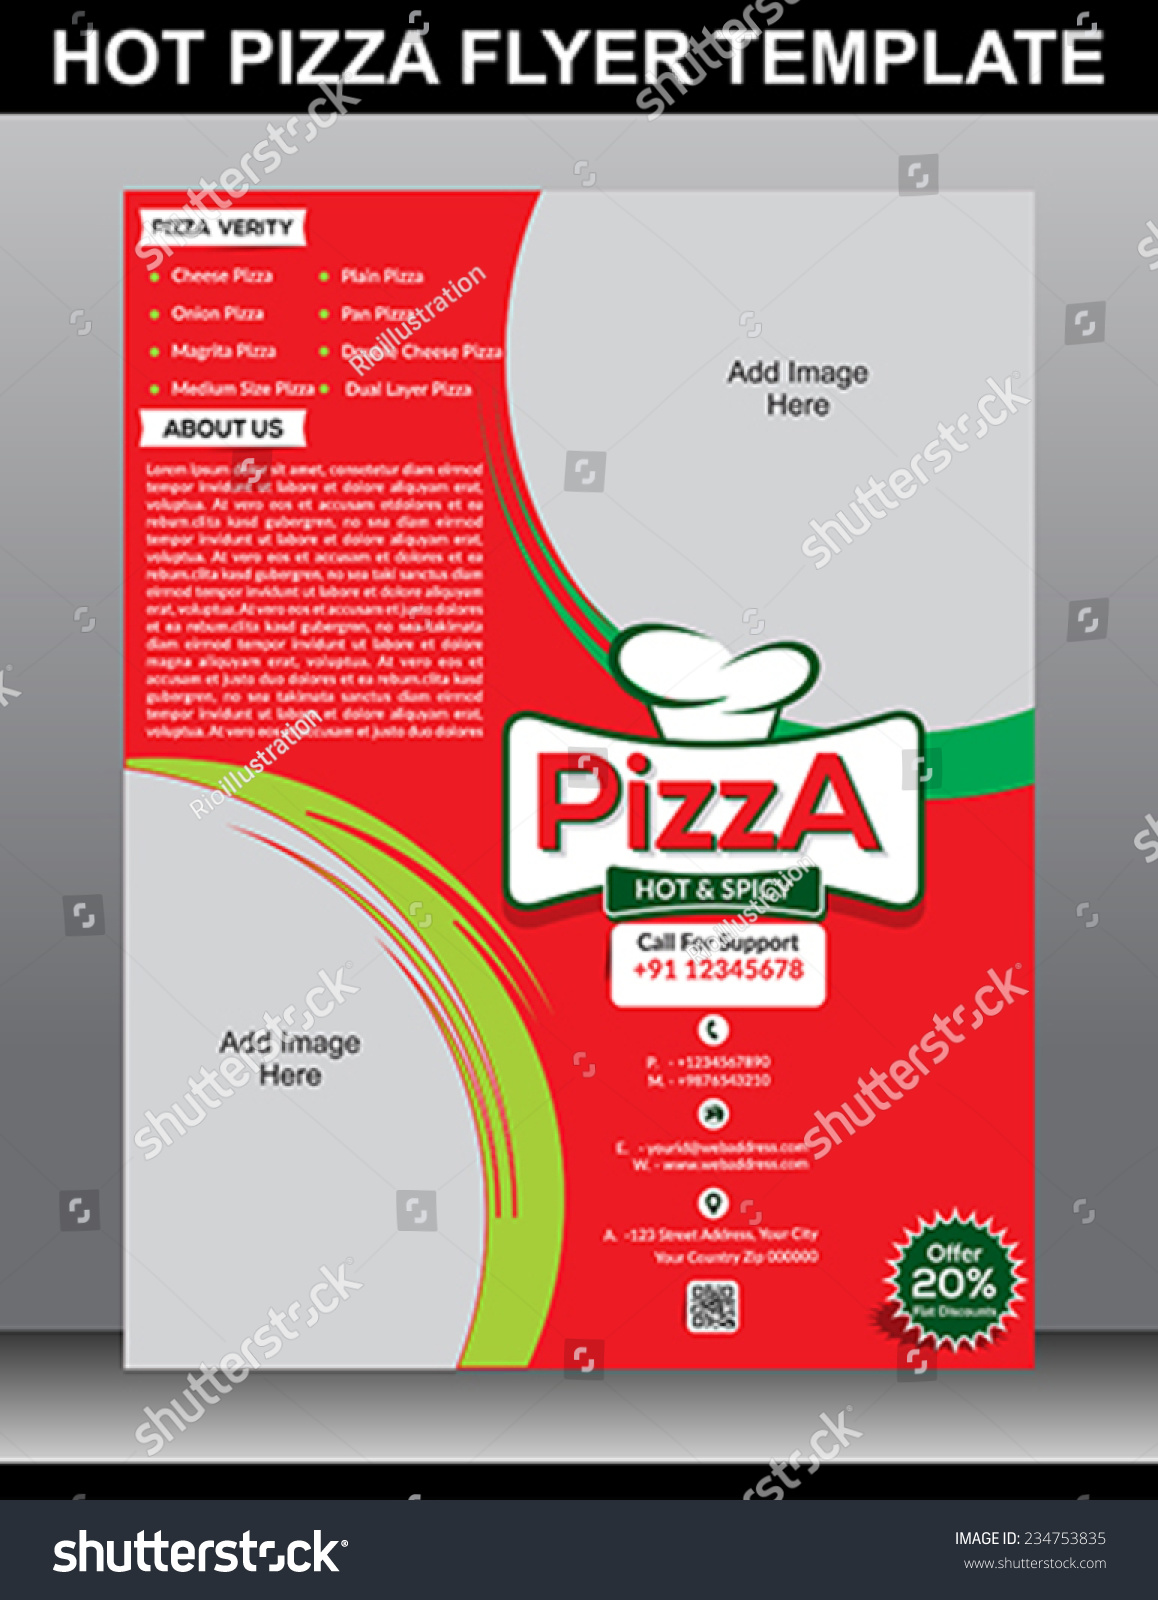 hot pizza flyer template vector illustration stock vector 234753835 shutterstock. Black Bedroom Furniture Sets. Home Design Ideas